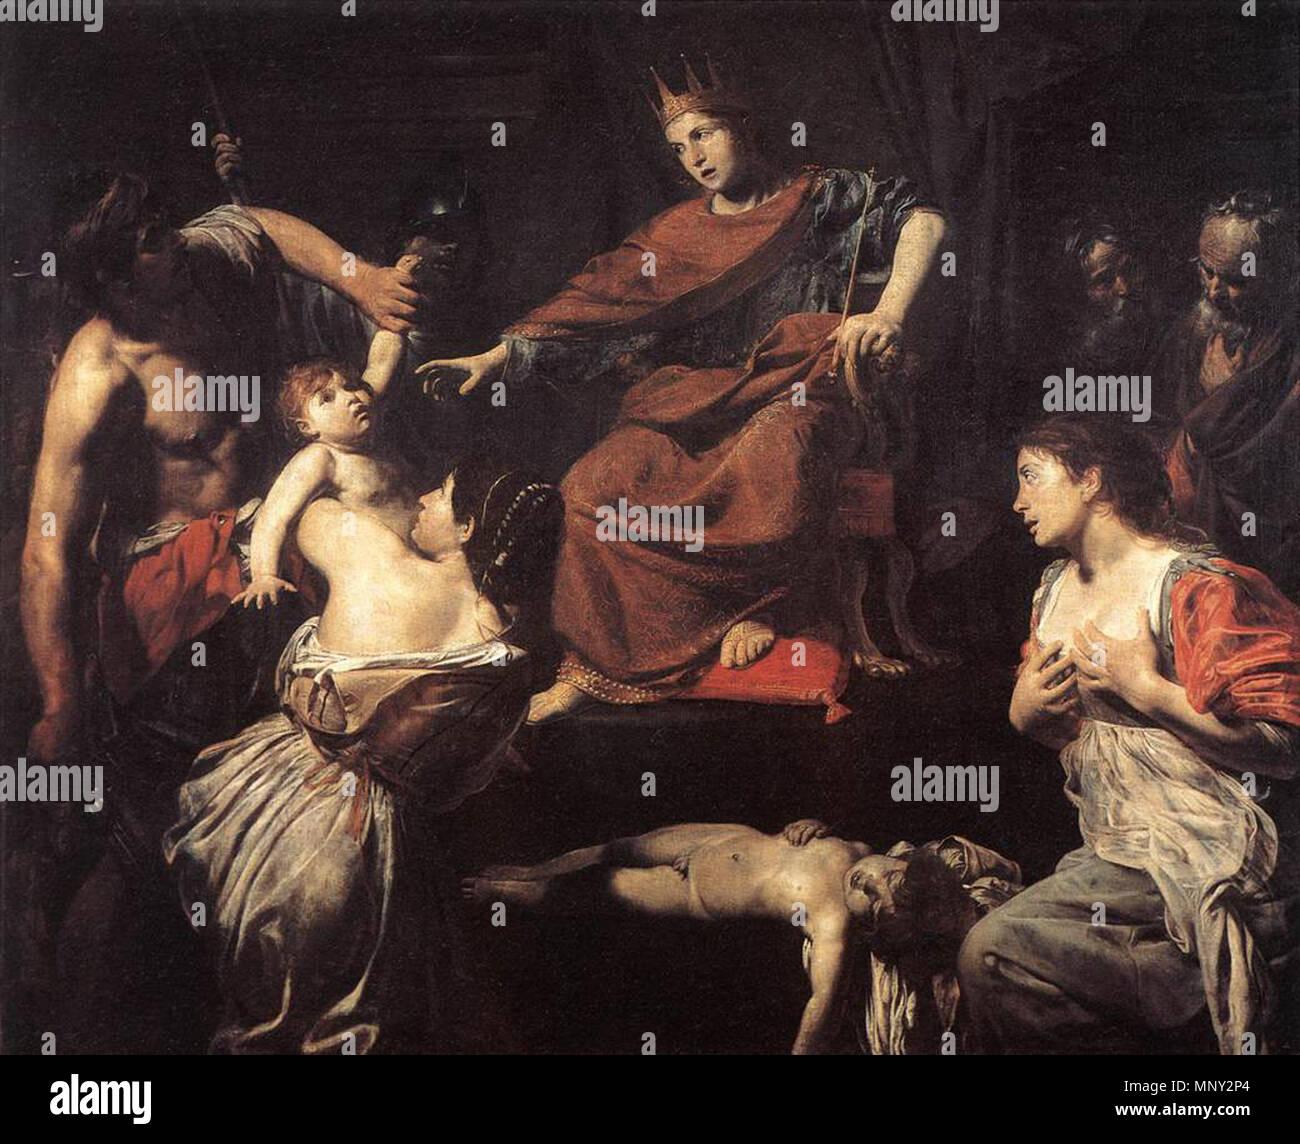 English: The Judgment of Solomon   circa 1625.   1218 Valentin de Boulogne - The Judgment of Solomon - WGA24249 - Stock Image